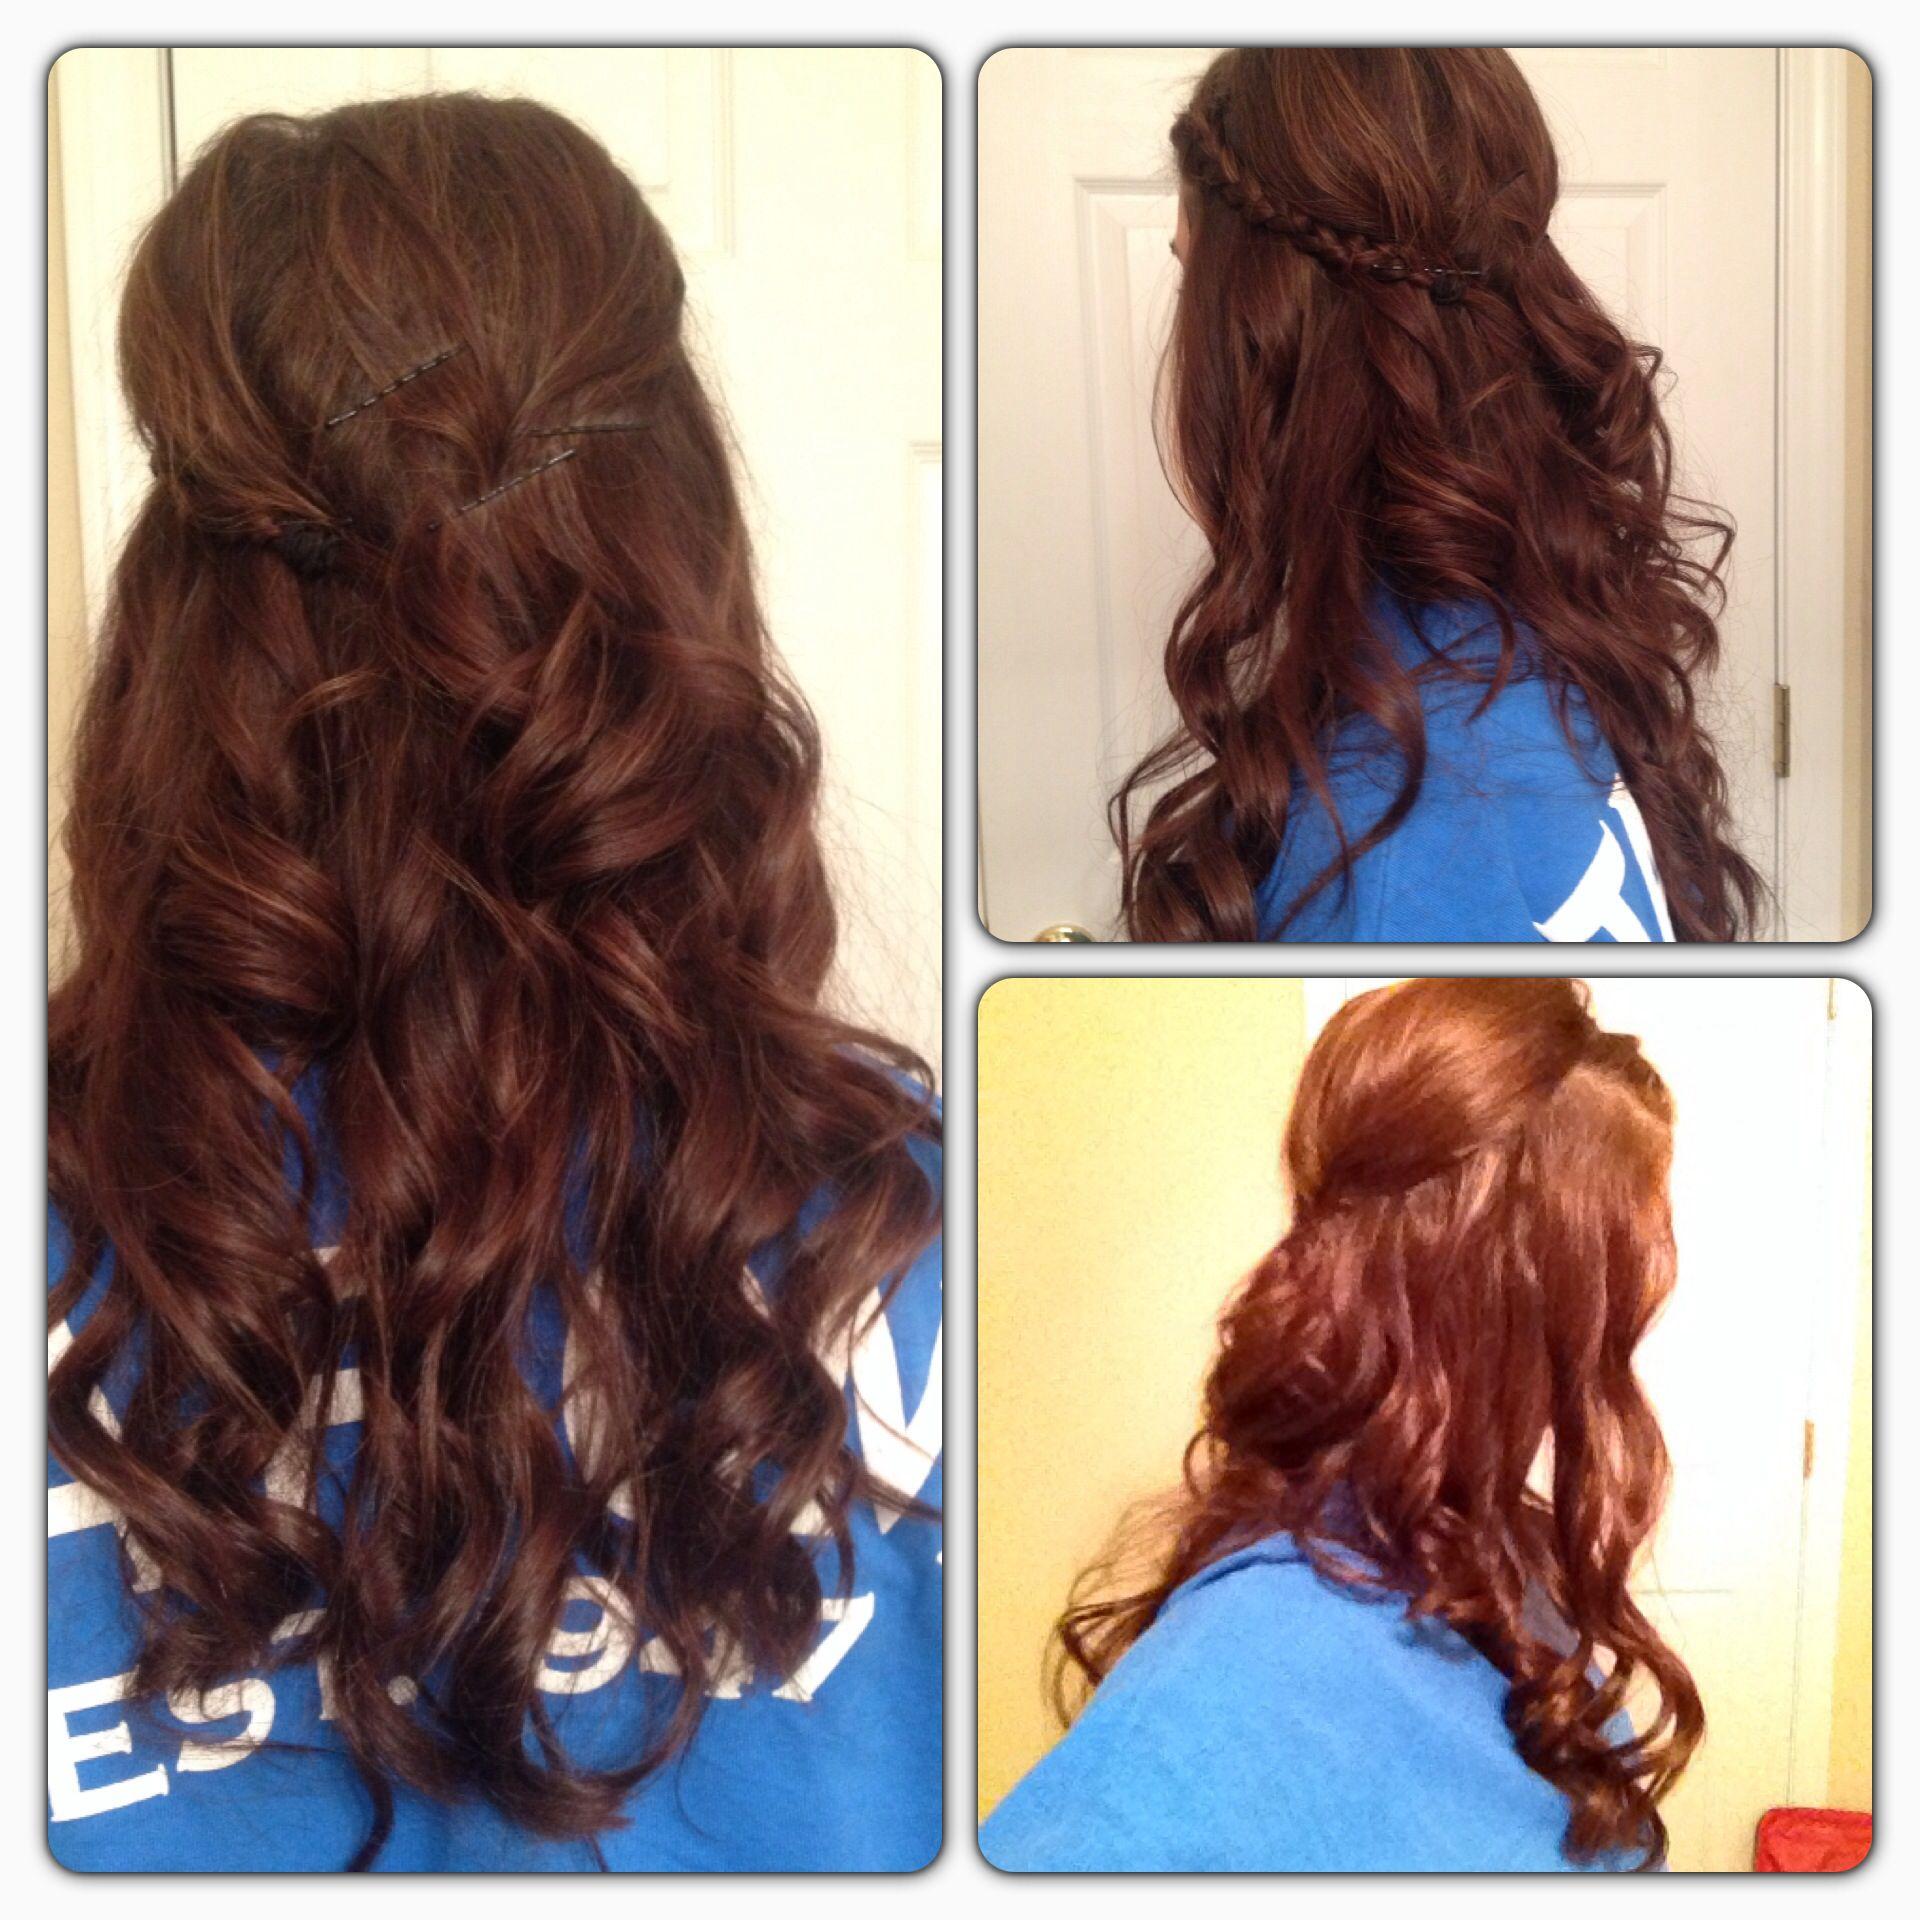 French braid and curls Braided hair ❤❤❤ Pinterest